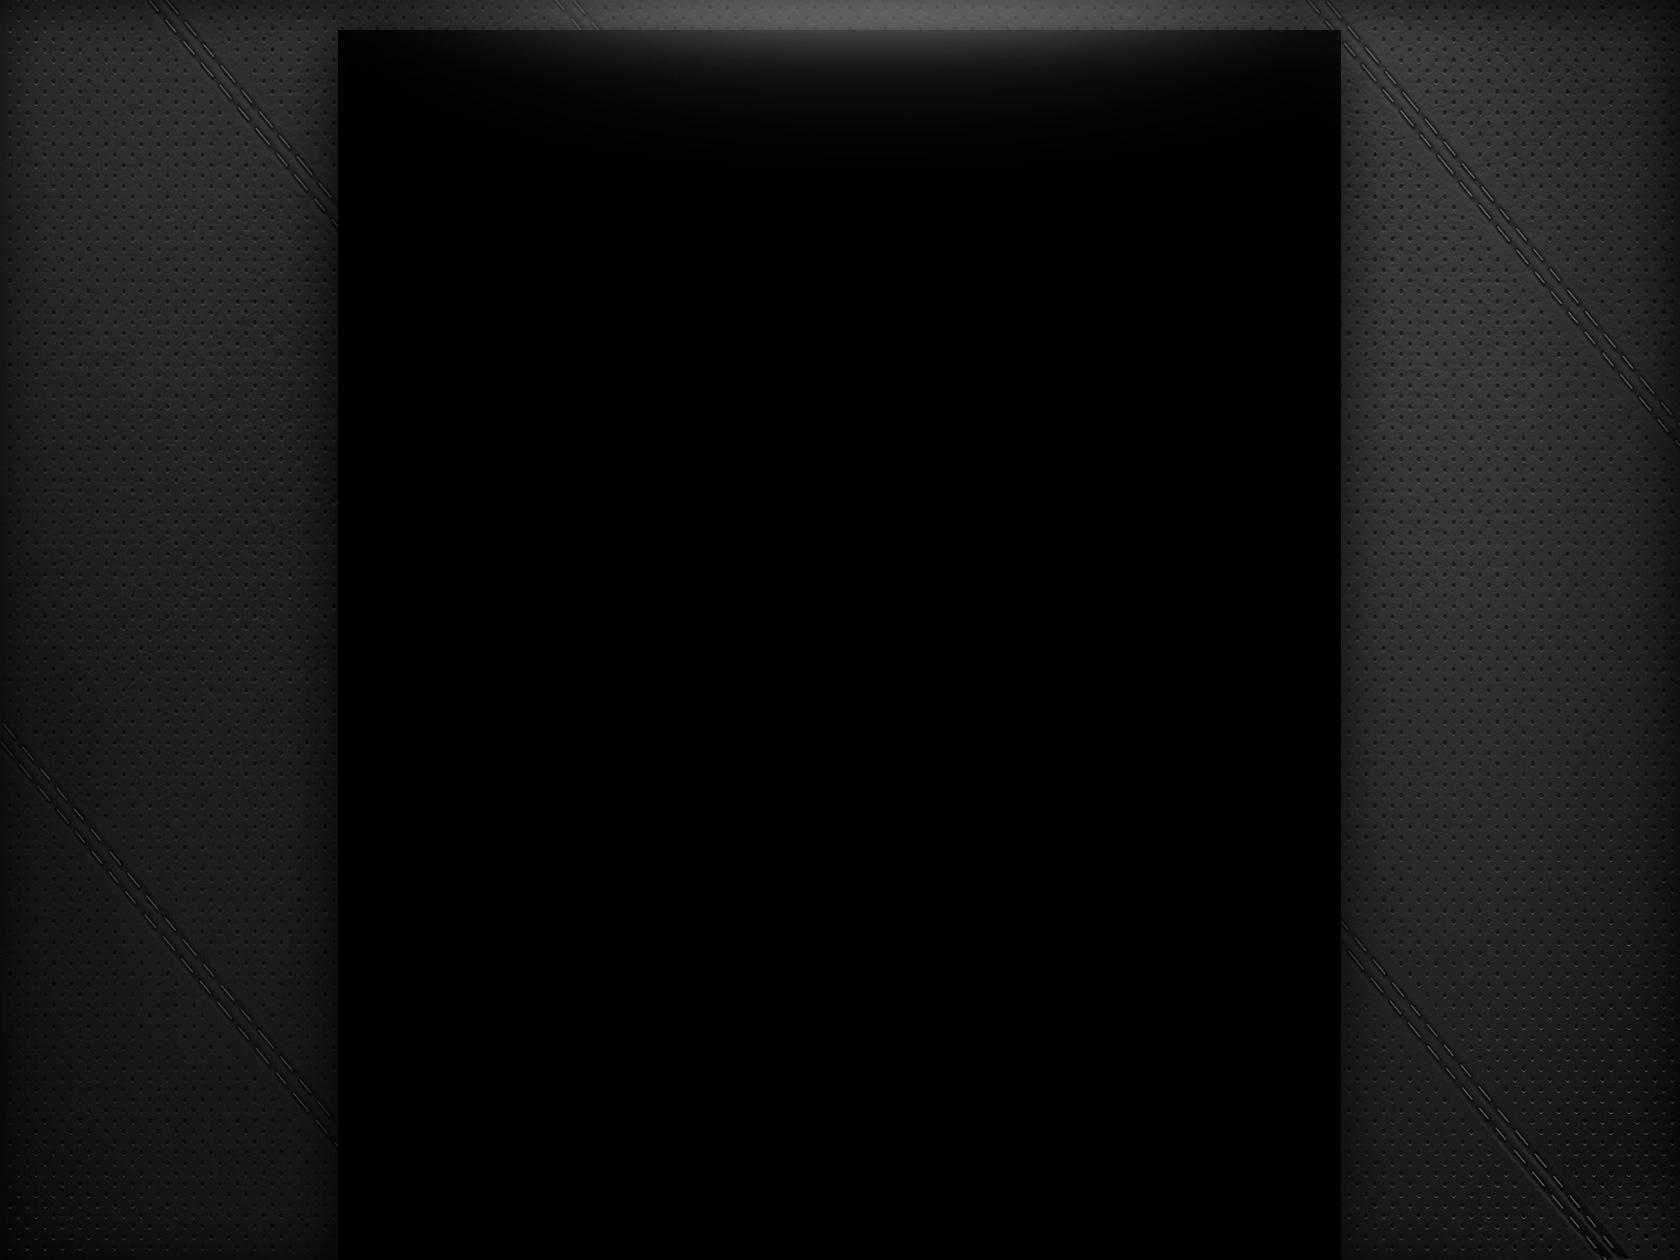 html фон изображение: